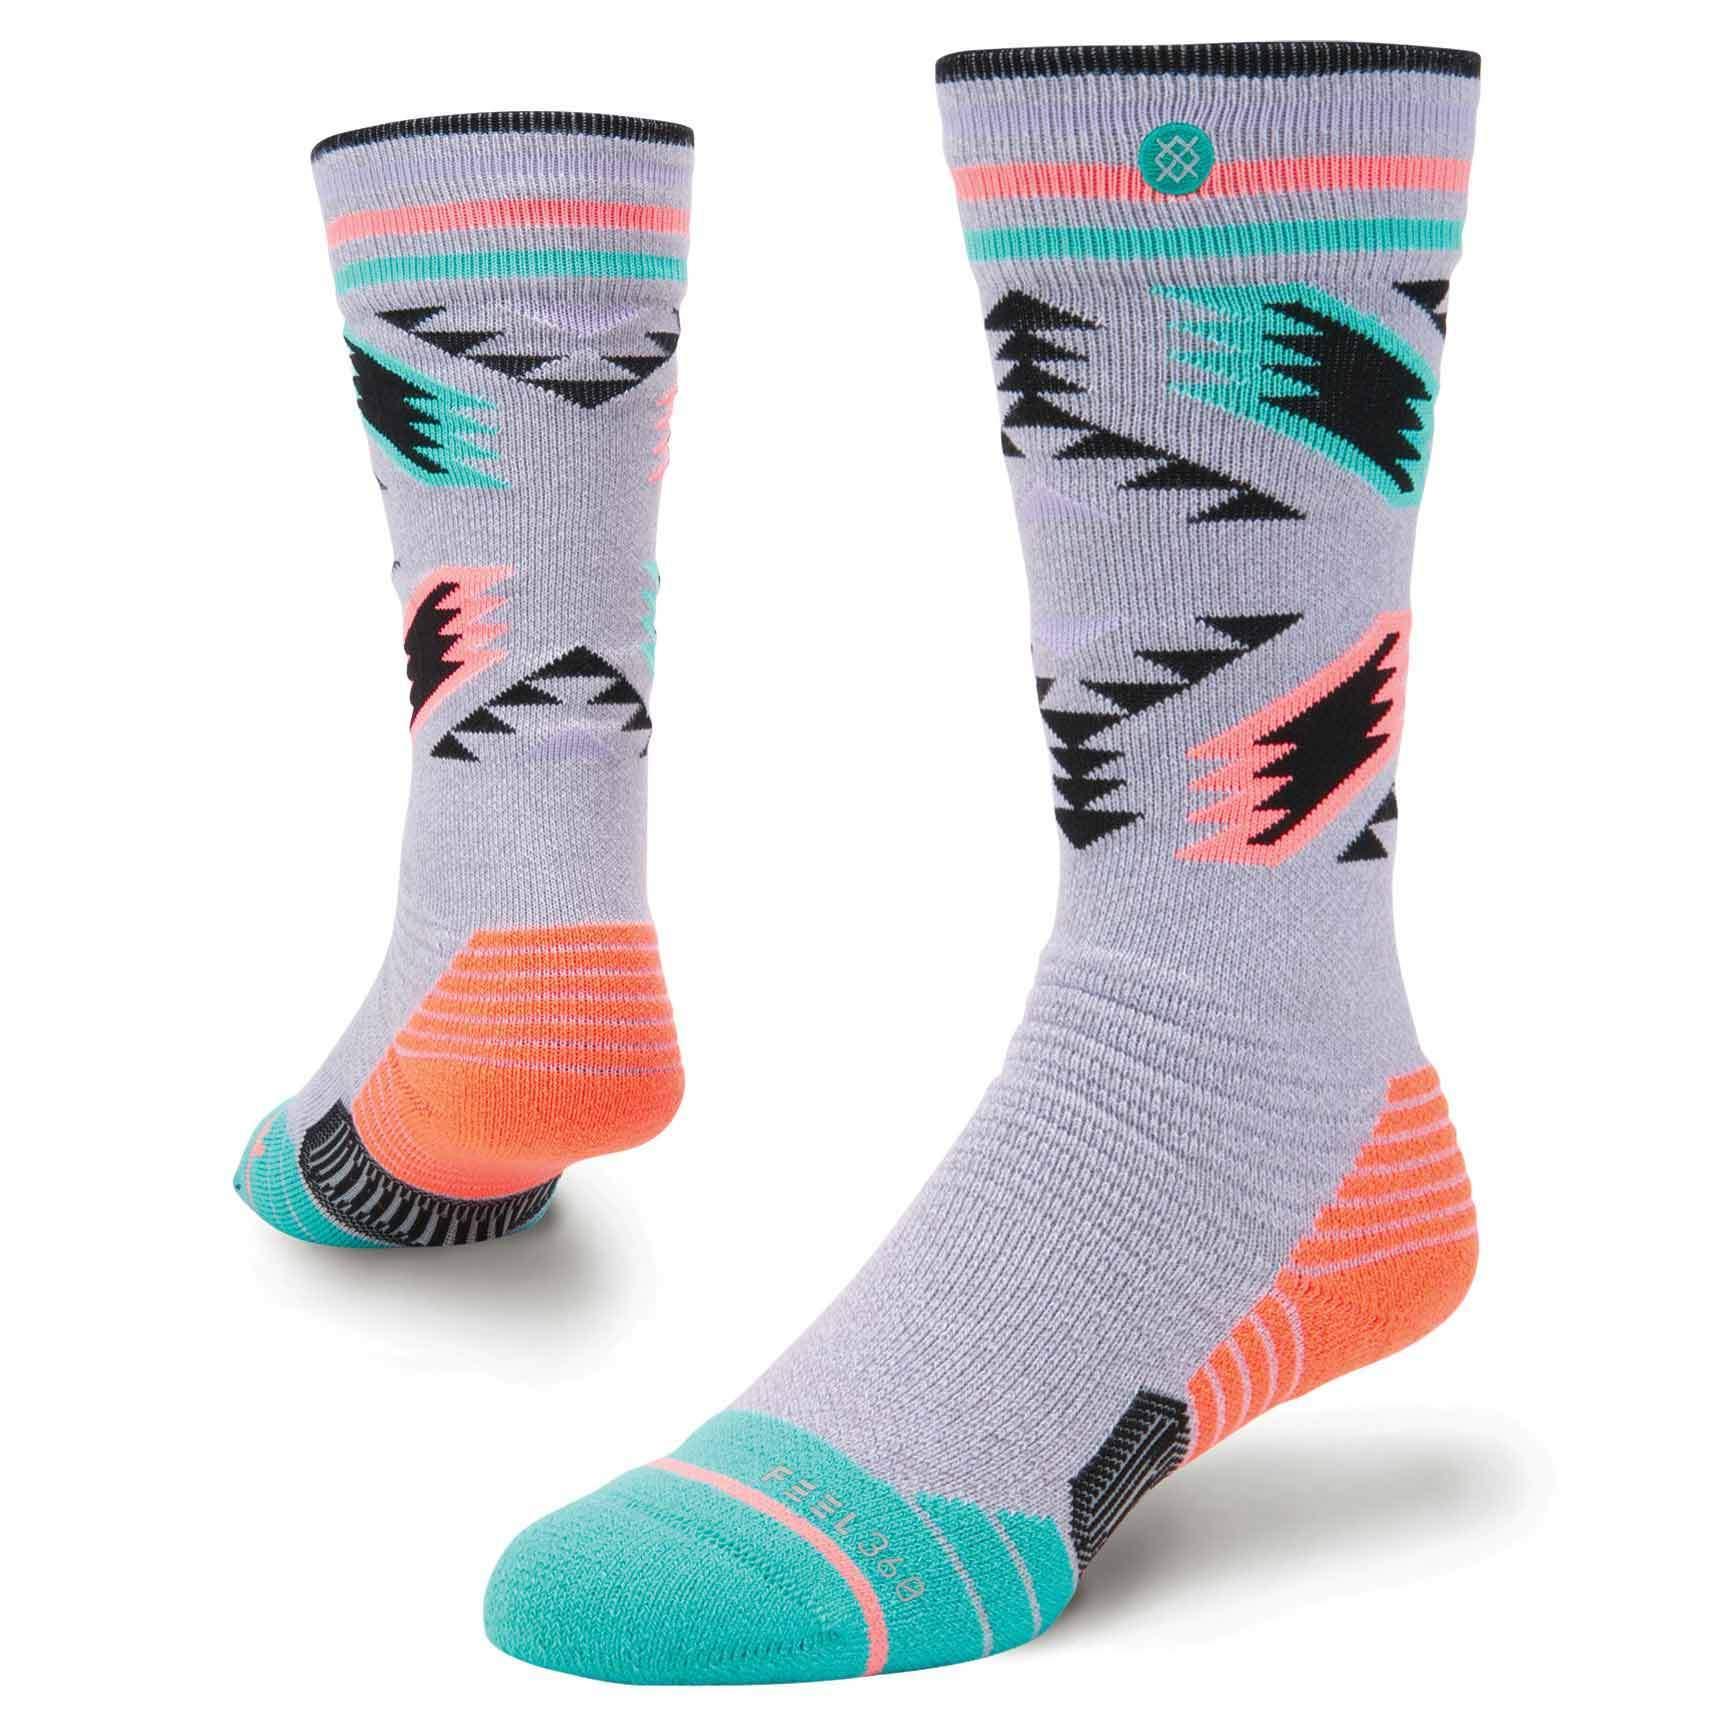 Thermal snow socks.